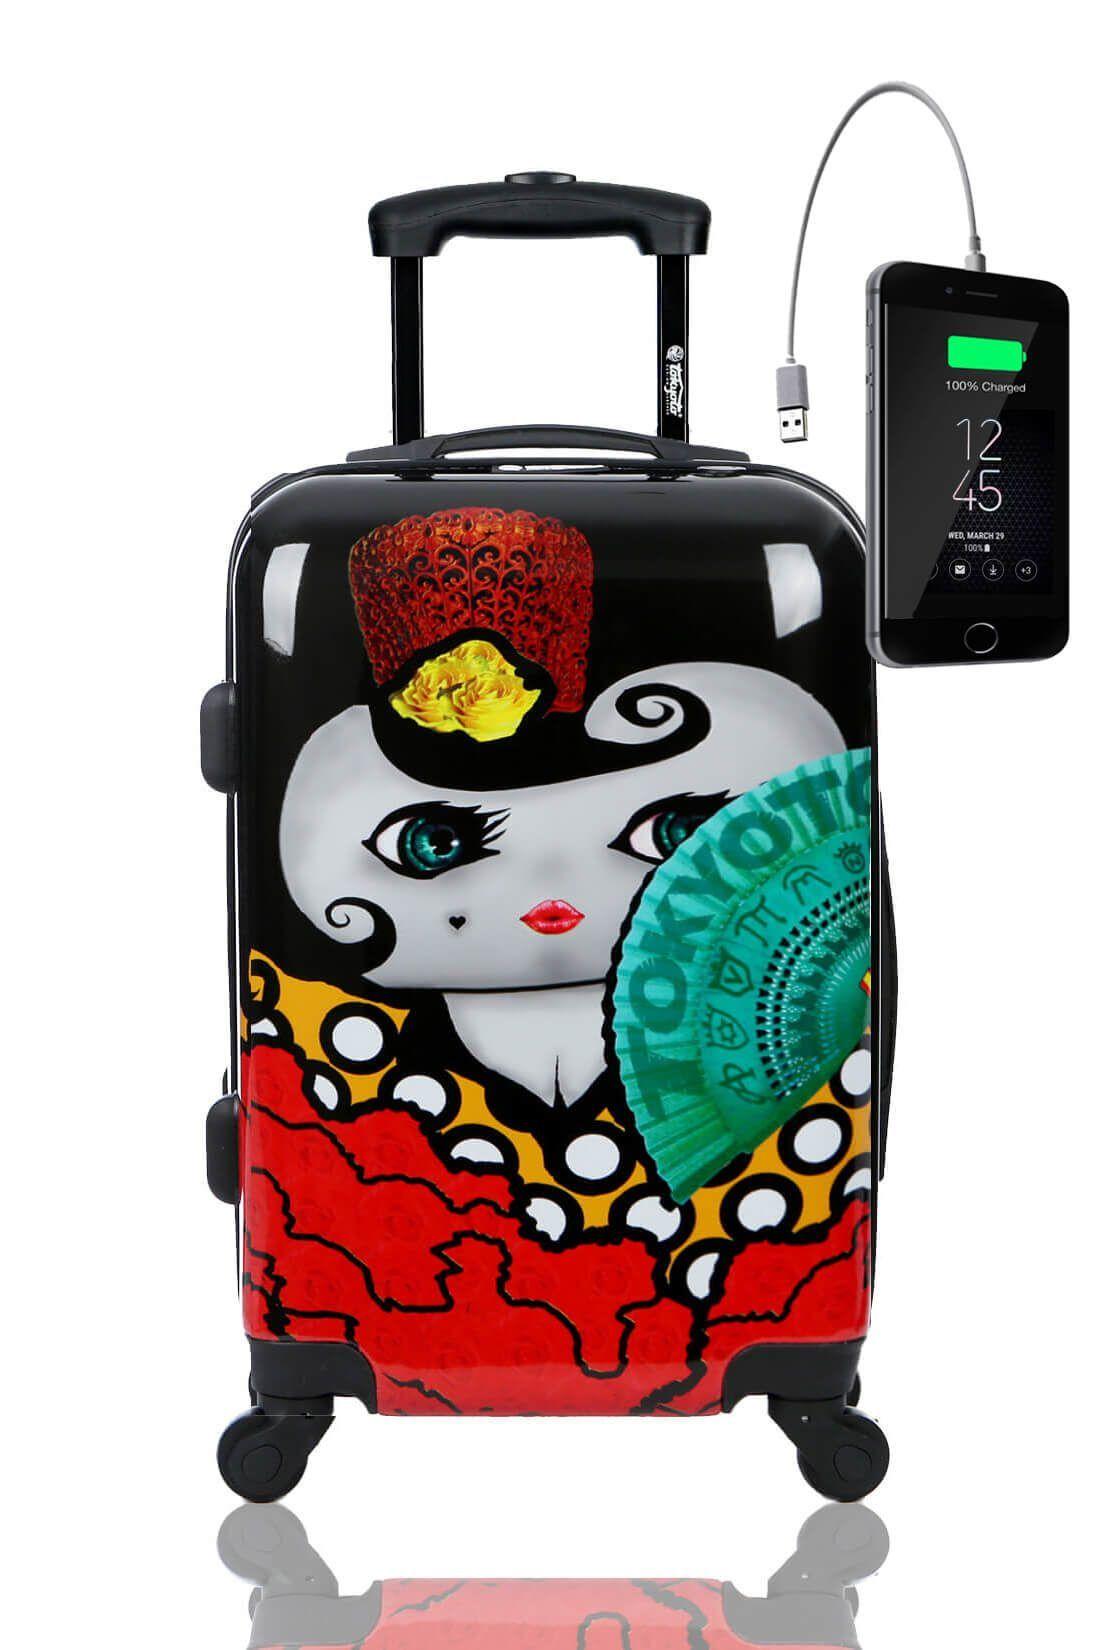 Kids Hand Trolley Cabin Luggage Suitcase Online Powerbank USB TOKYOTO FLAMENCA